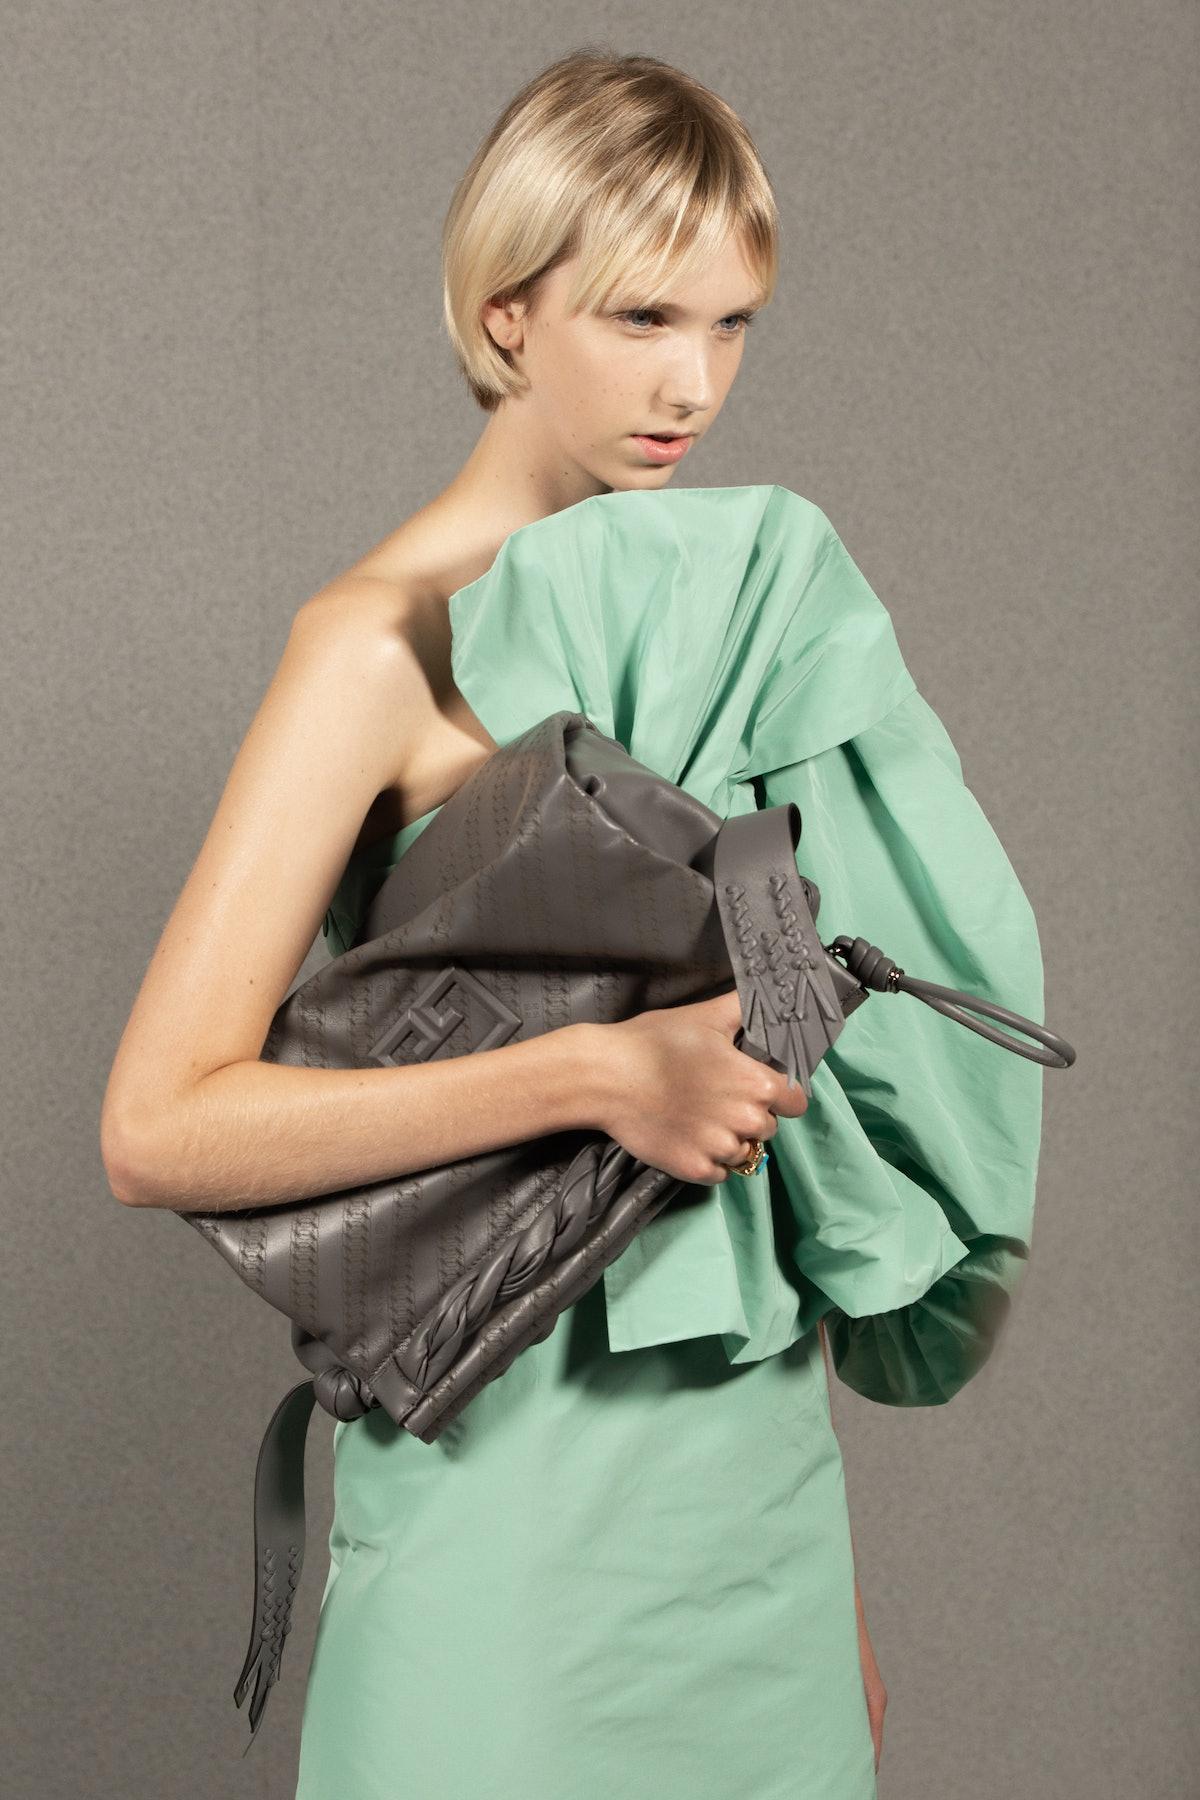 Serichai_Givenchy-110.jpg